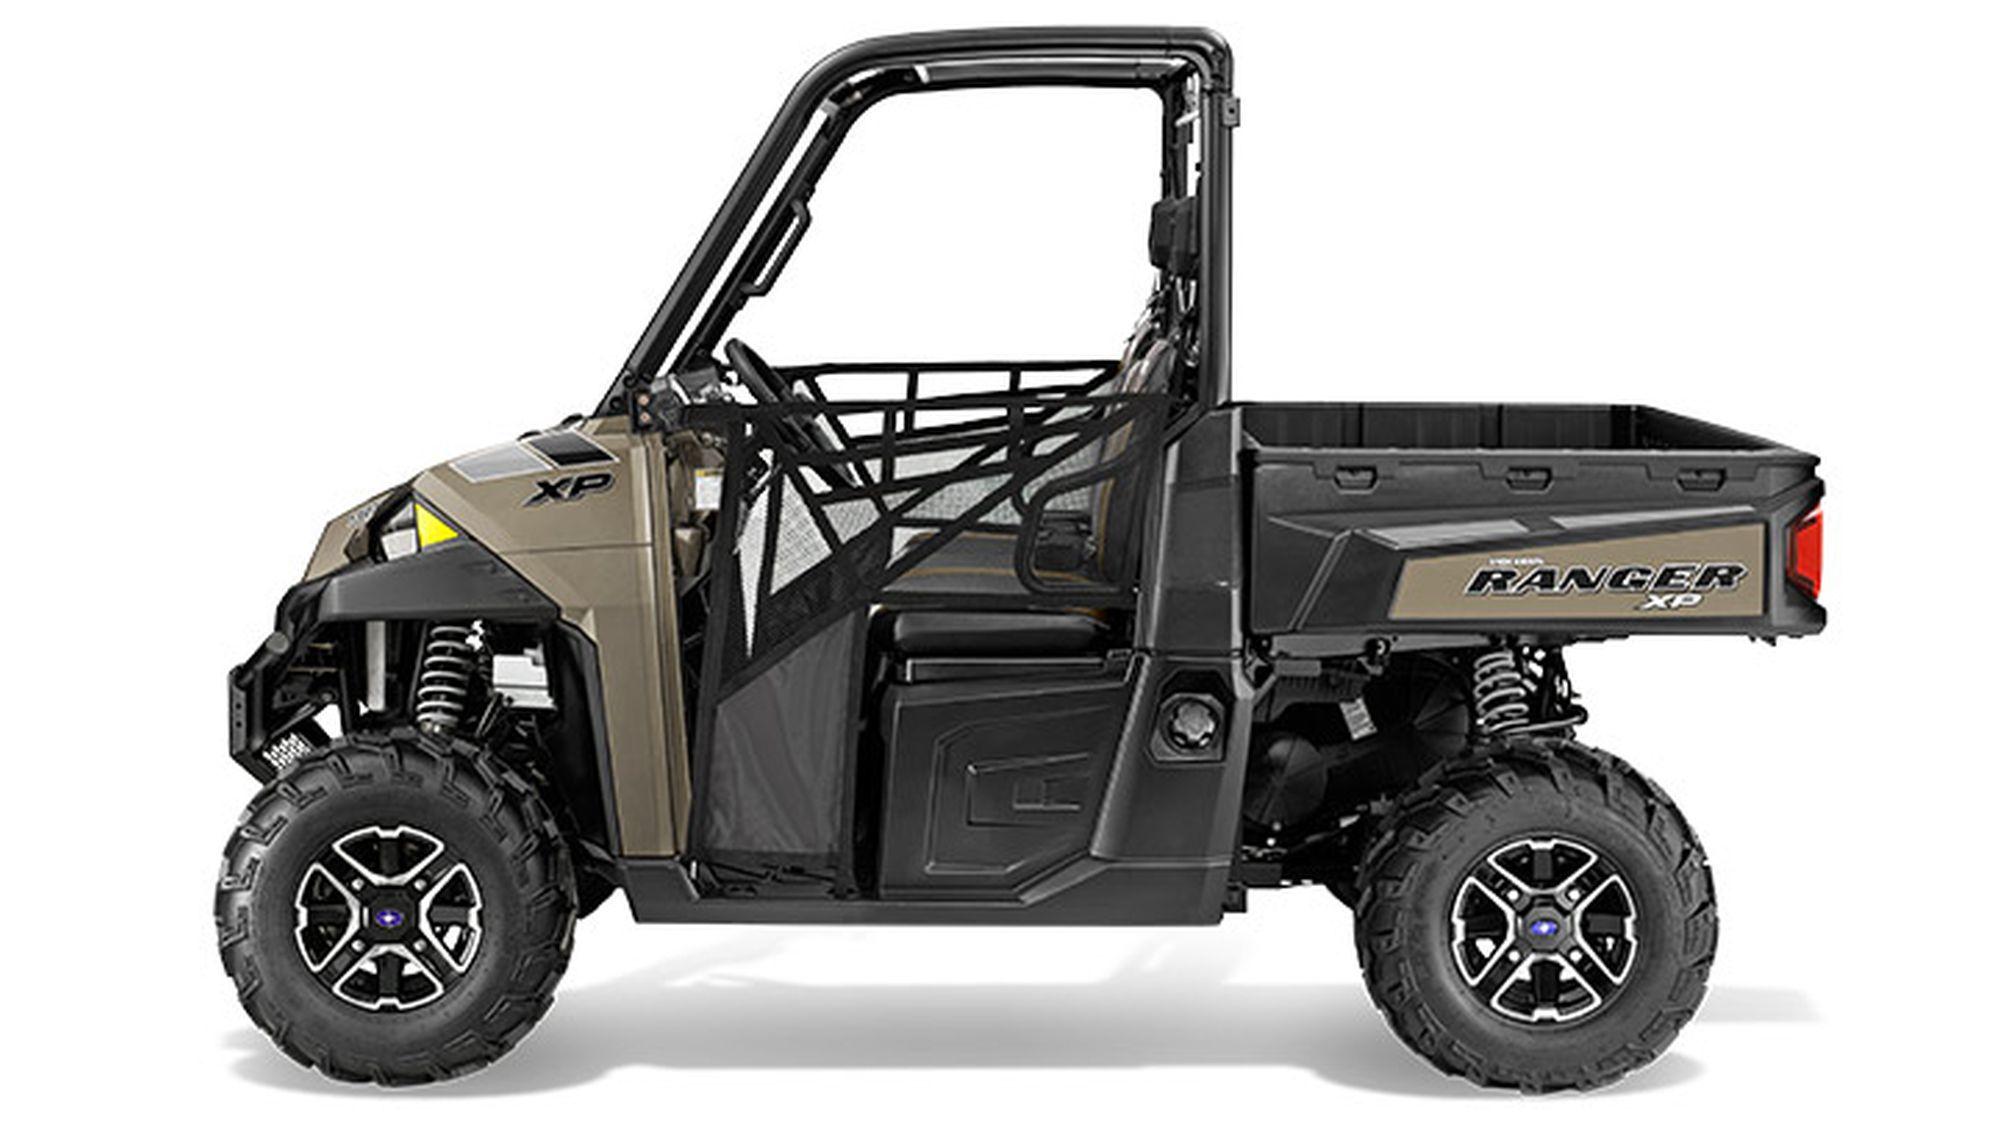 2015 Polaris Ranger 900xp | Autos Post